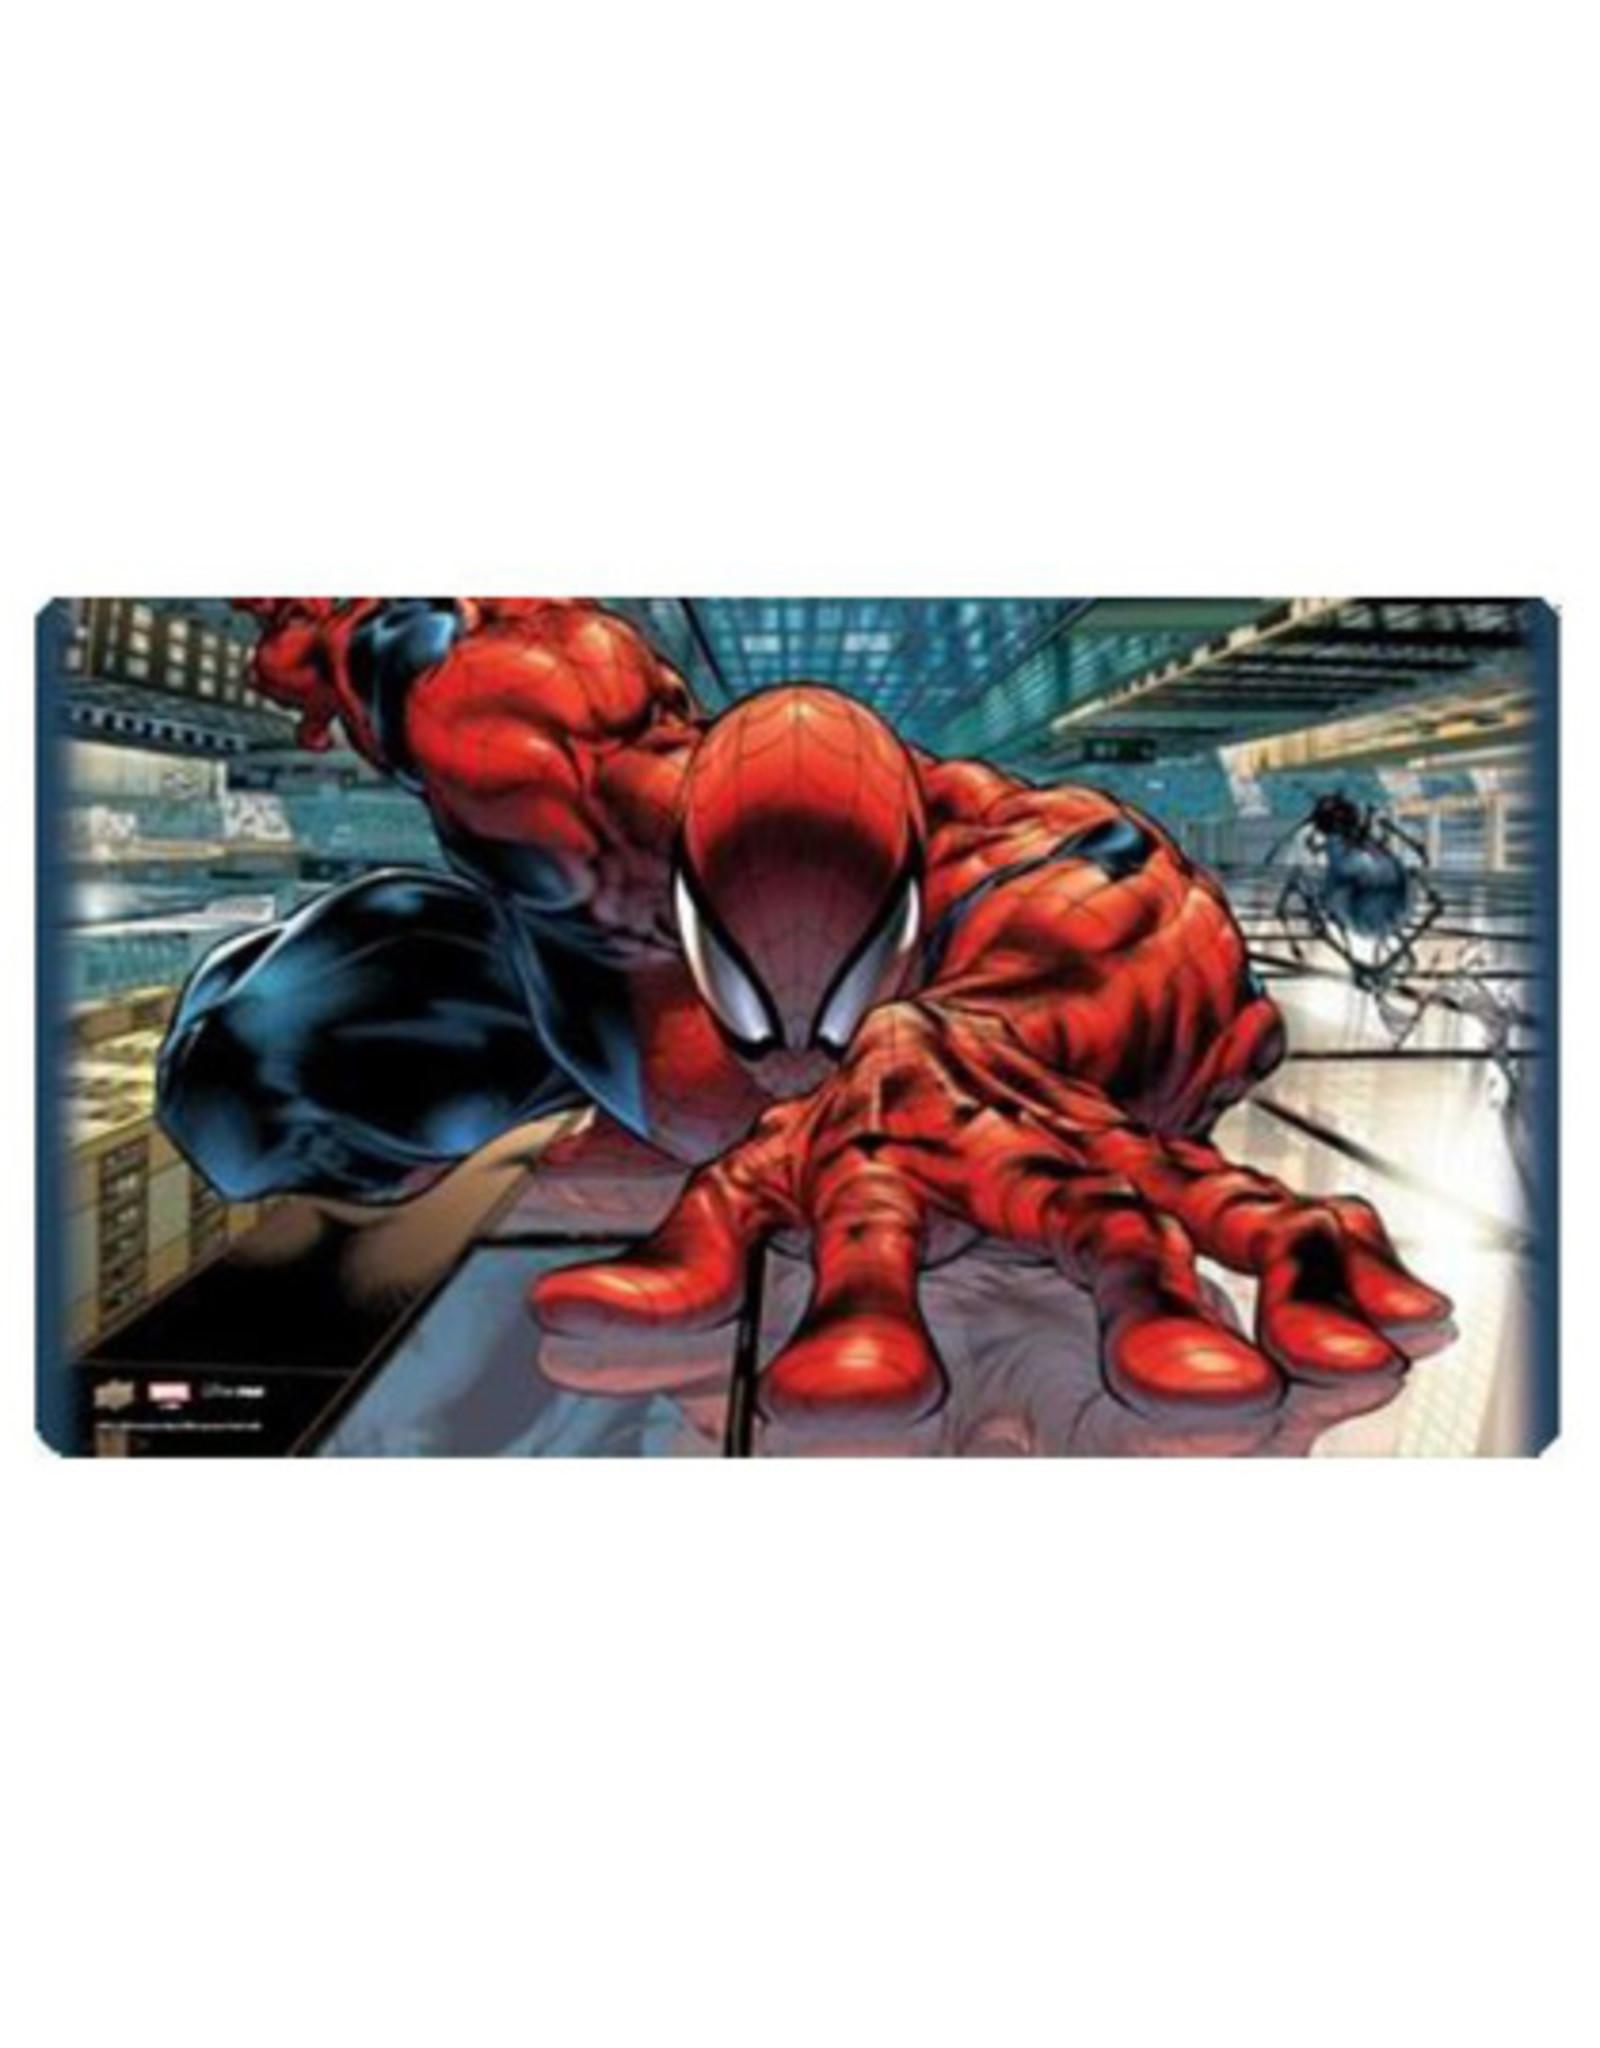 ULTRA PRO ULTRA PRO MARVEL PLAYMAT SPIDER-MAN